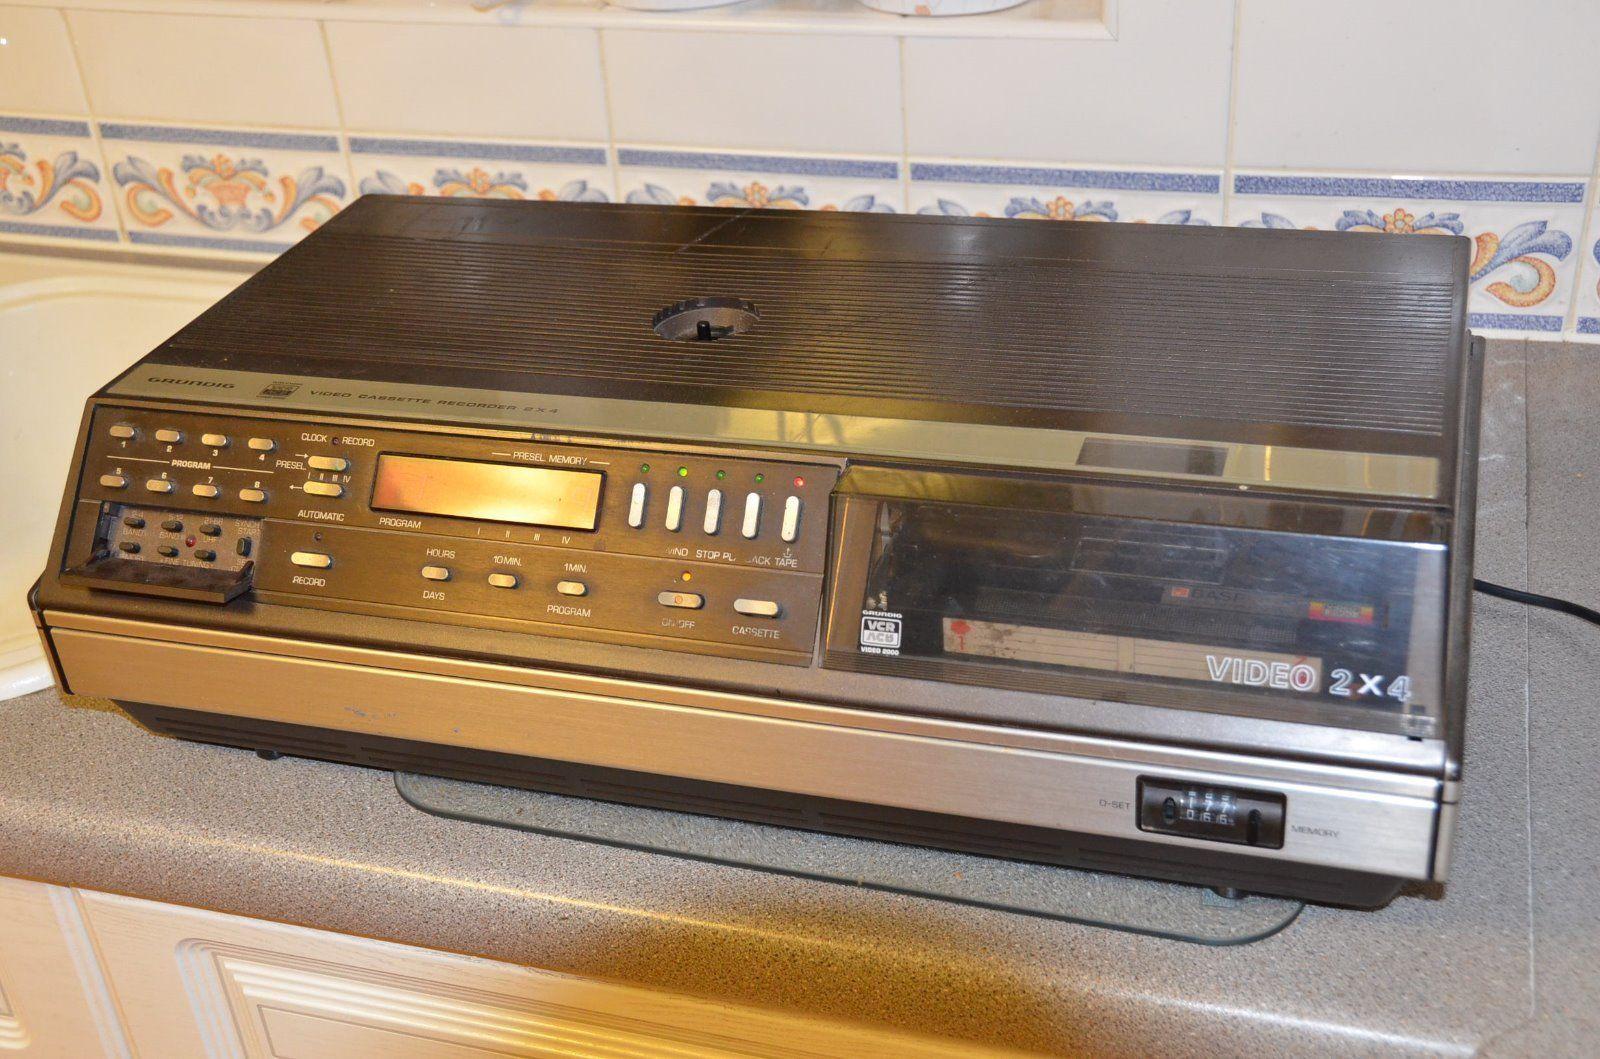 Grundig Video 2000 Video 2x4 VCR Video Recorder eBay